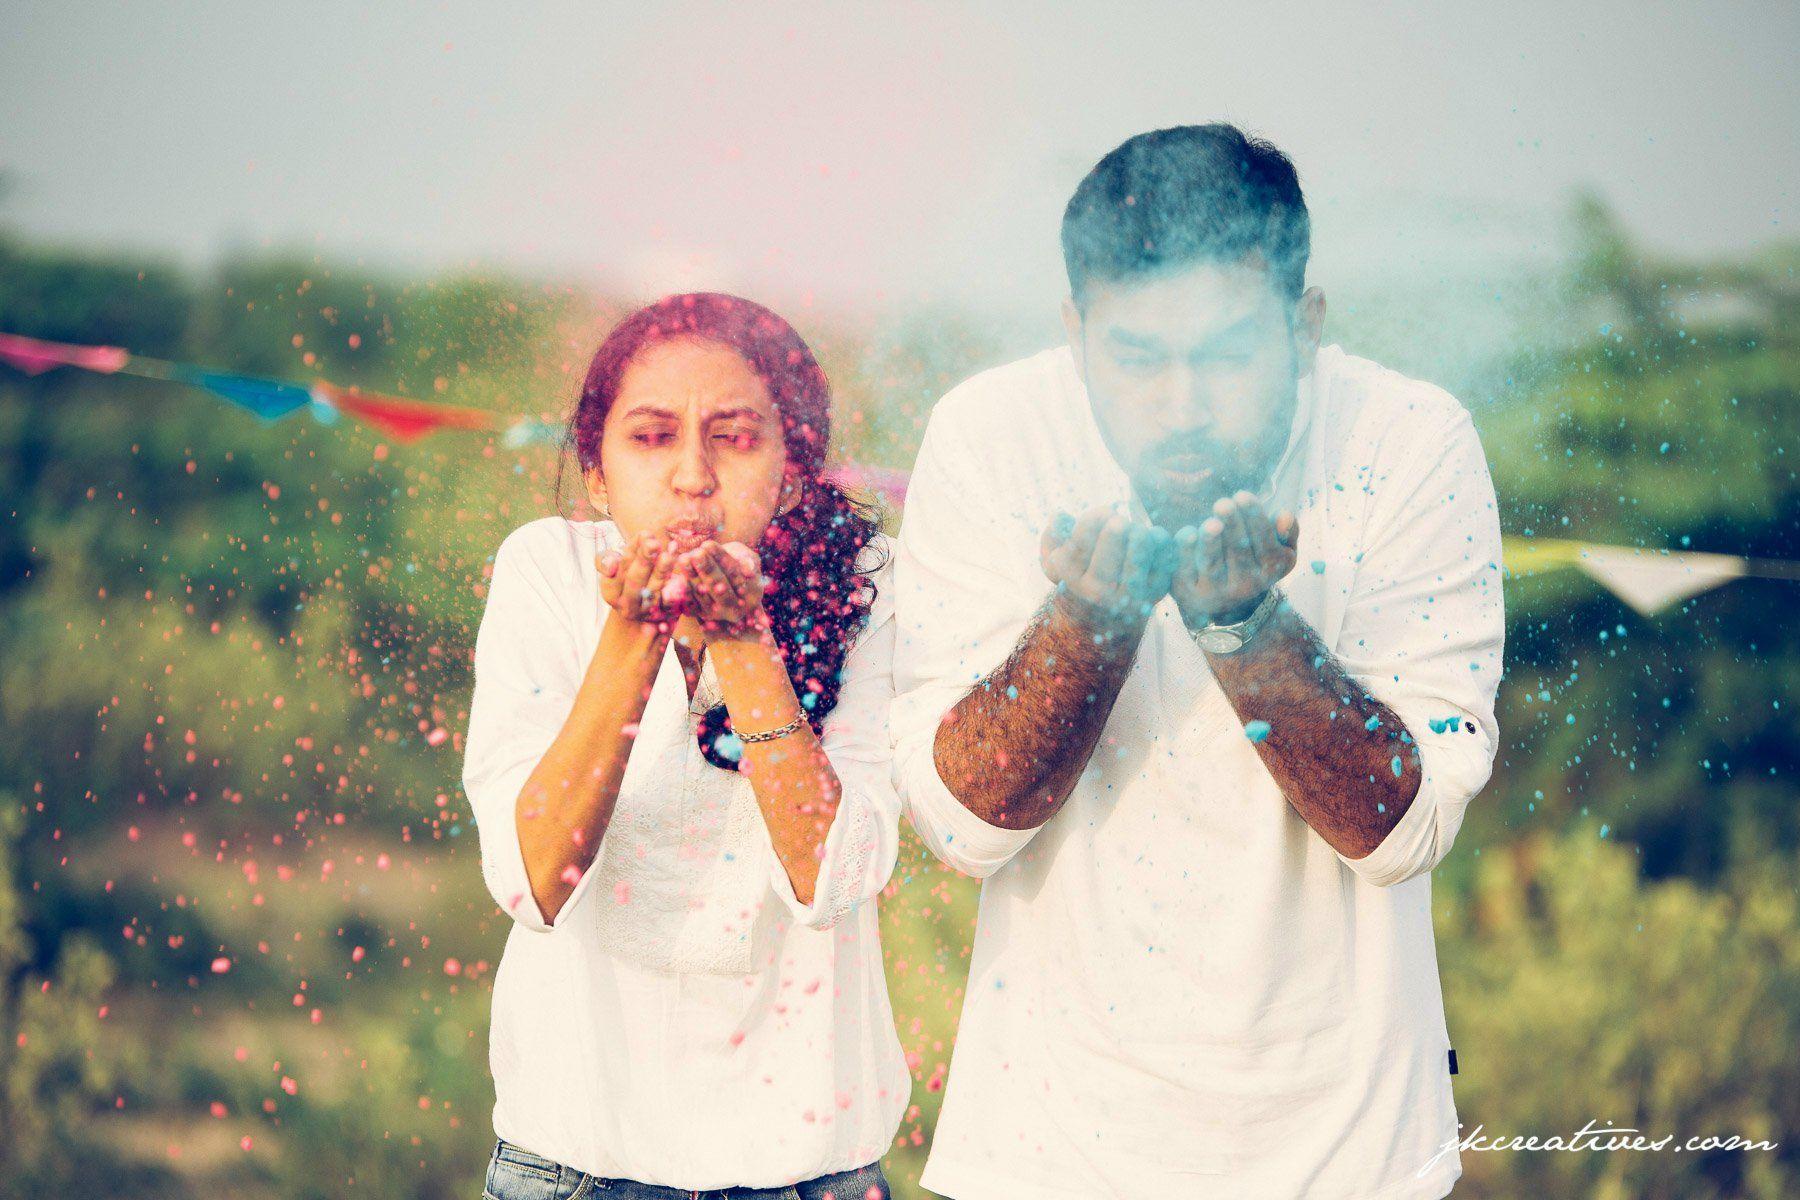 jkcreatives_outdoor-couple-shoot-at-coimbatore_holi-theme-couple-shoot_027-couple